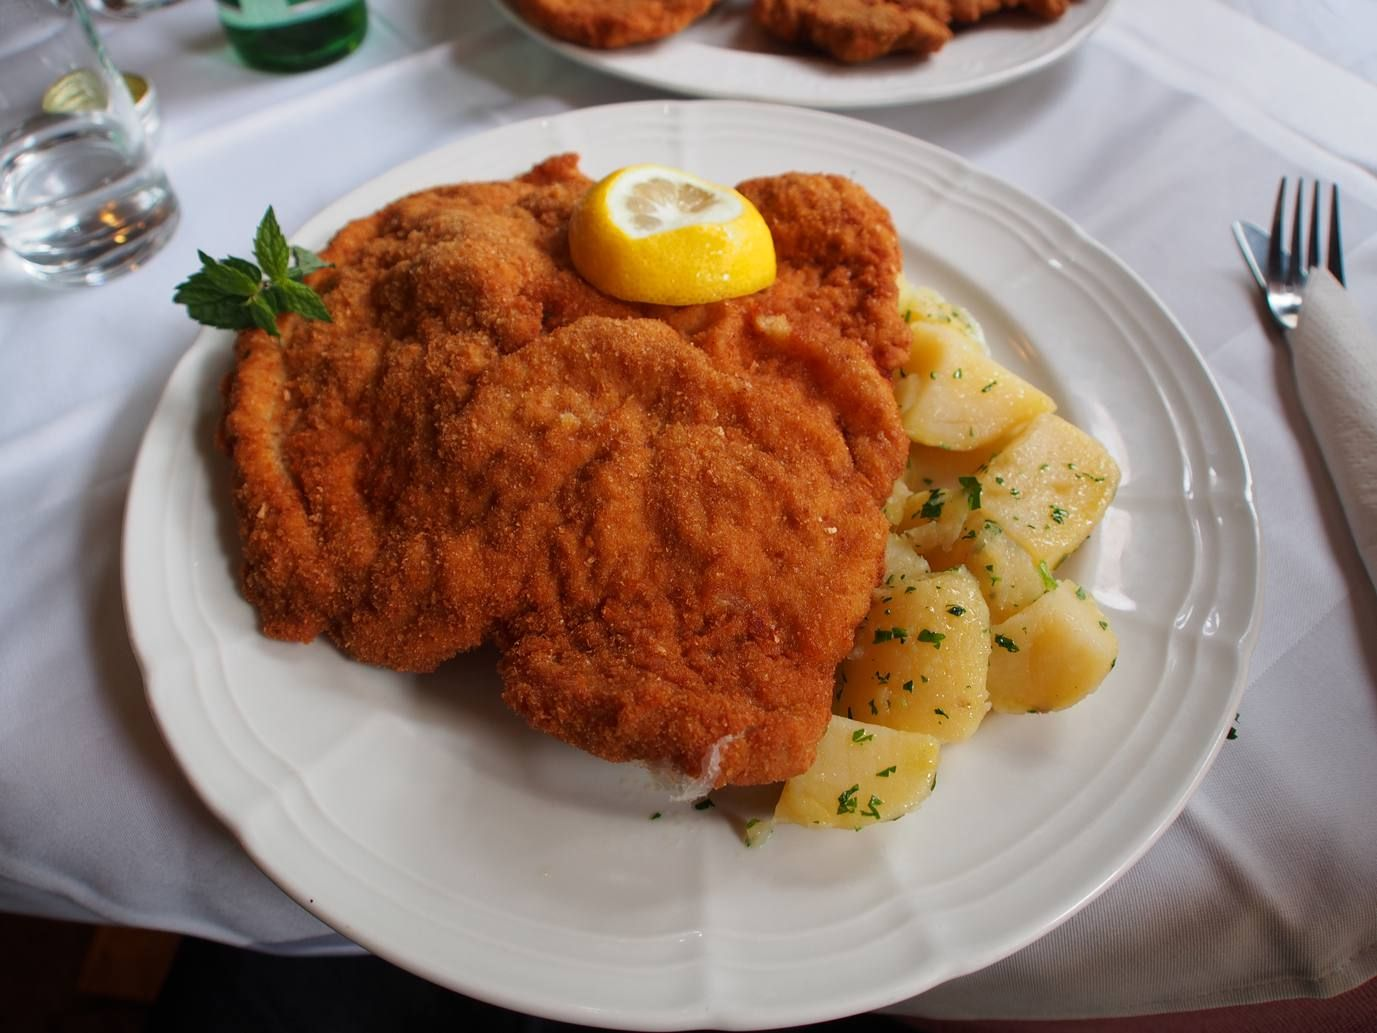 The Top 10 Austrian Foods to Try in Vienna | Austrian recipes, Vienna food,  Austria food